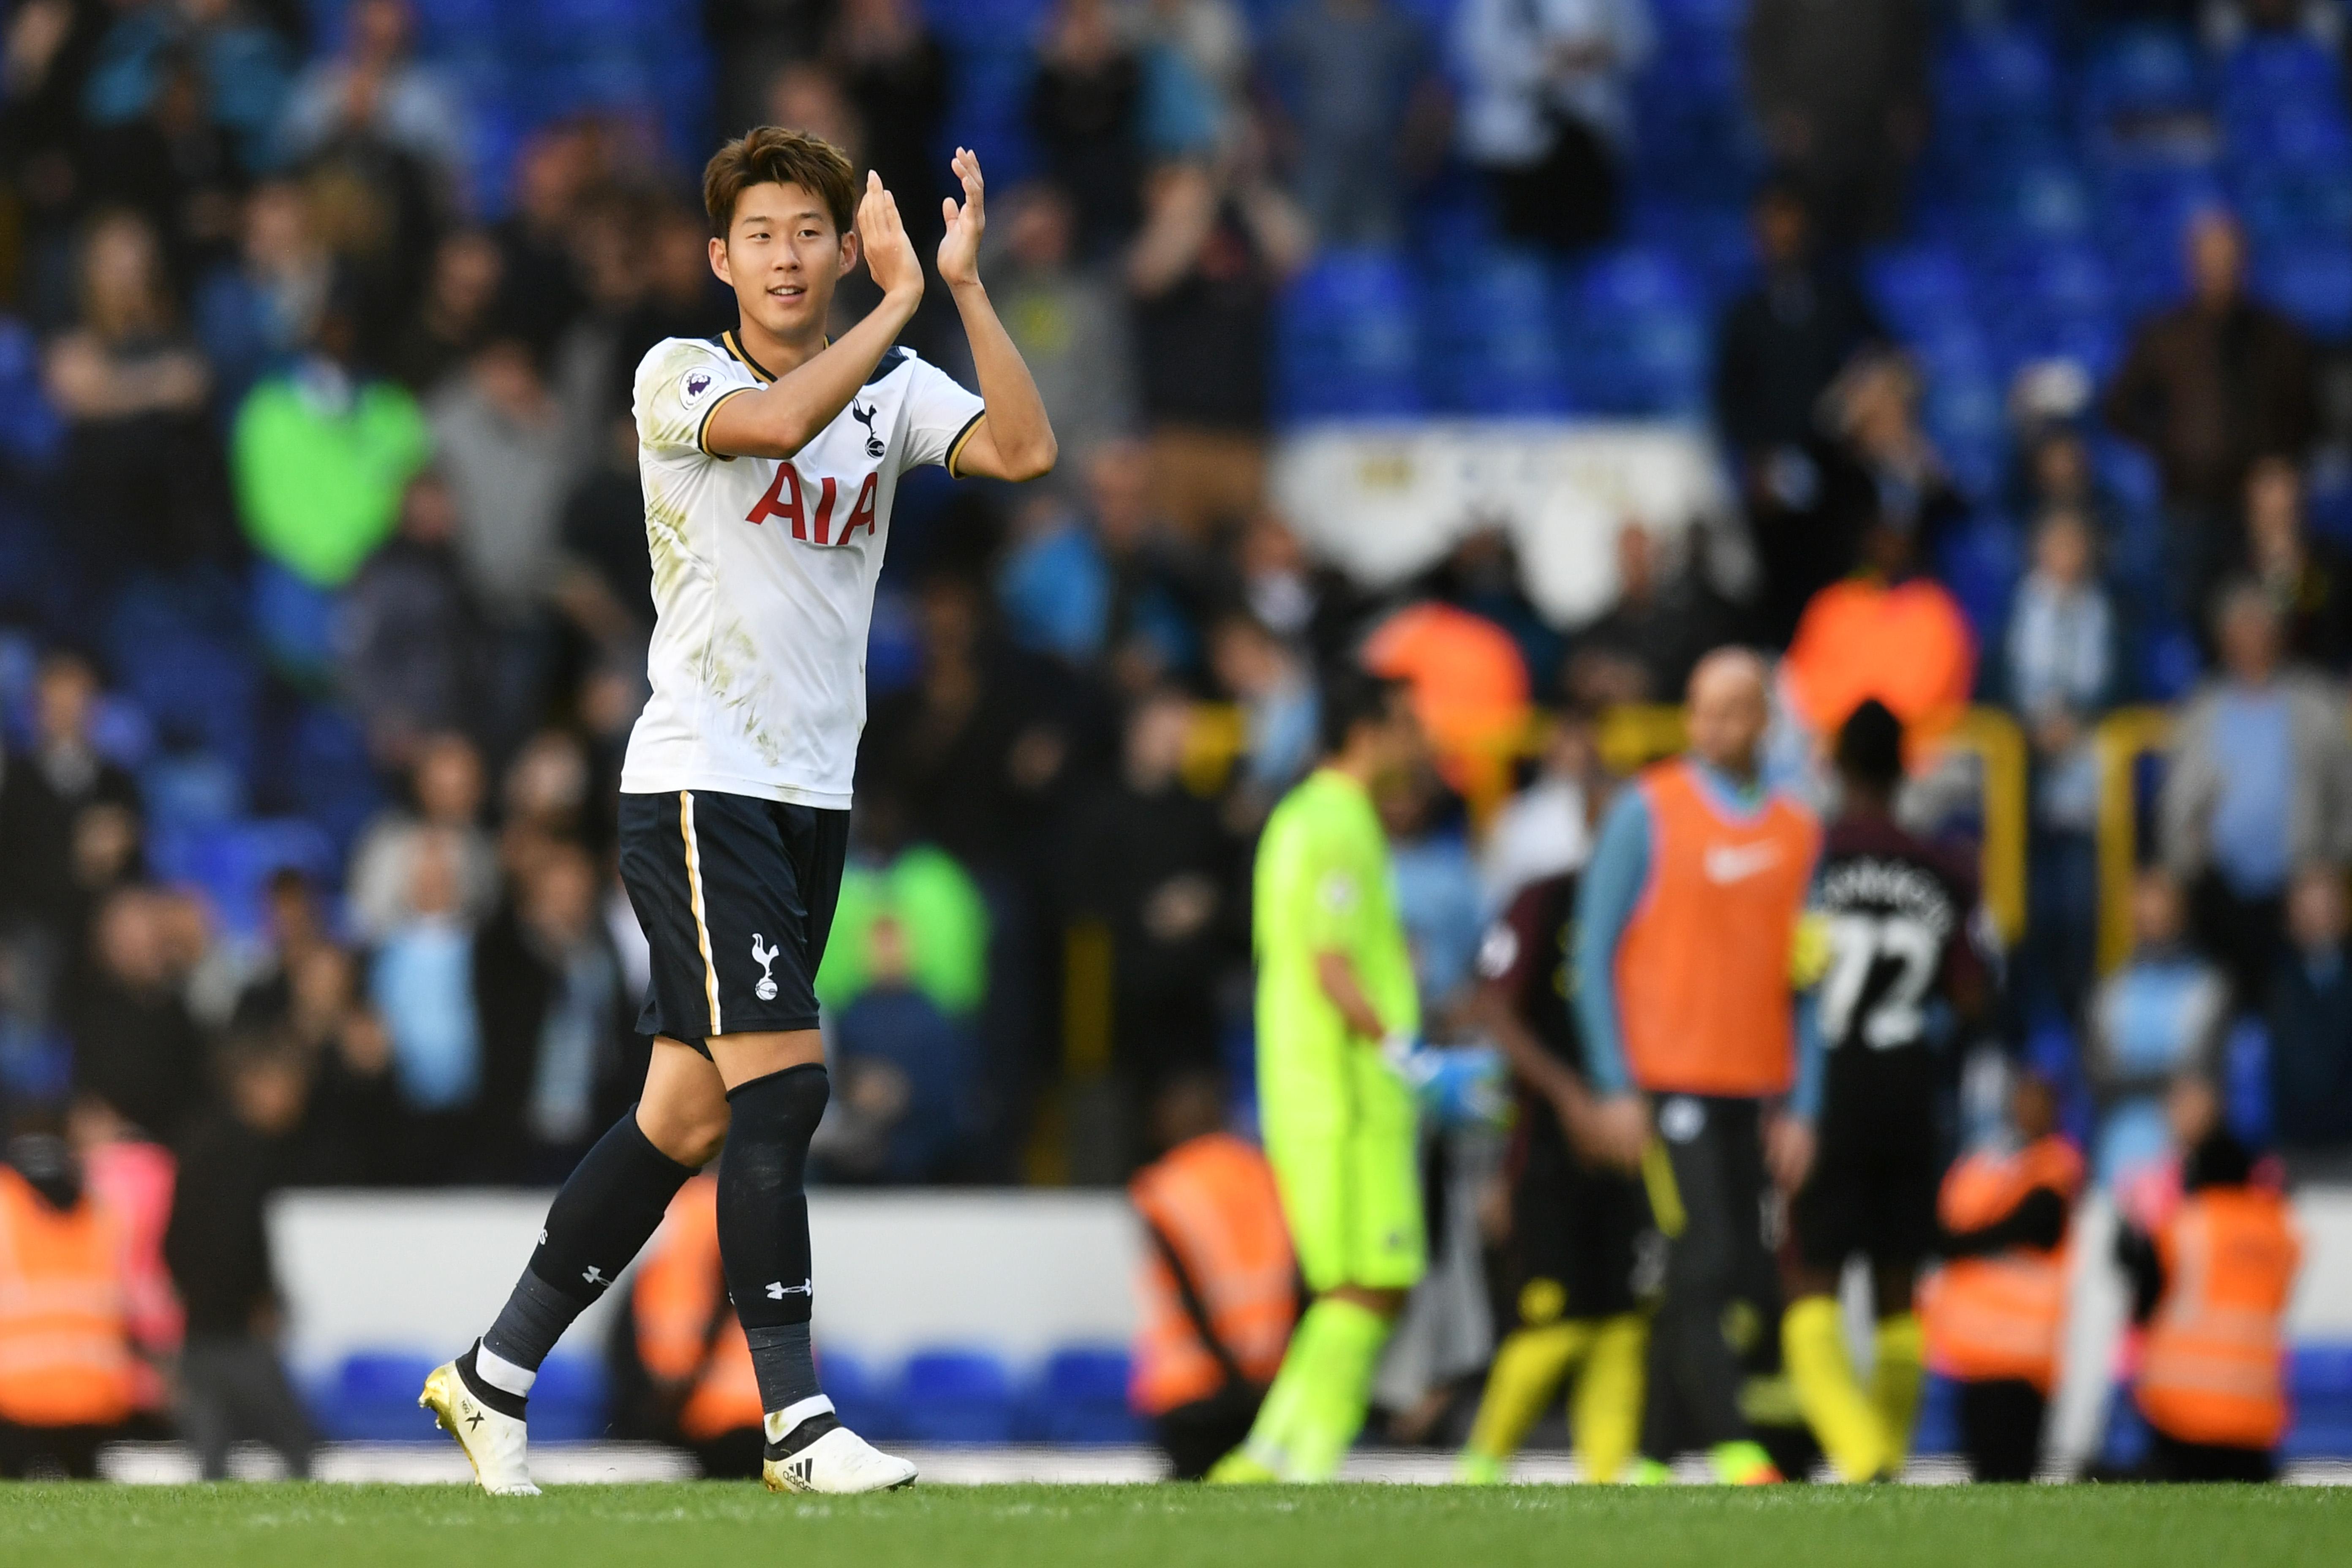 Tottenham Vs Leicester Live Stream: Tottenham Vs. Leicester Premier League Live Stream